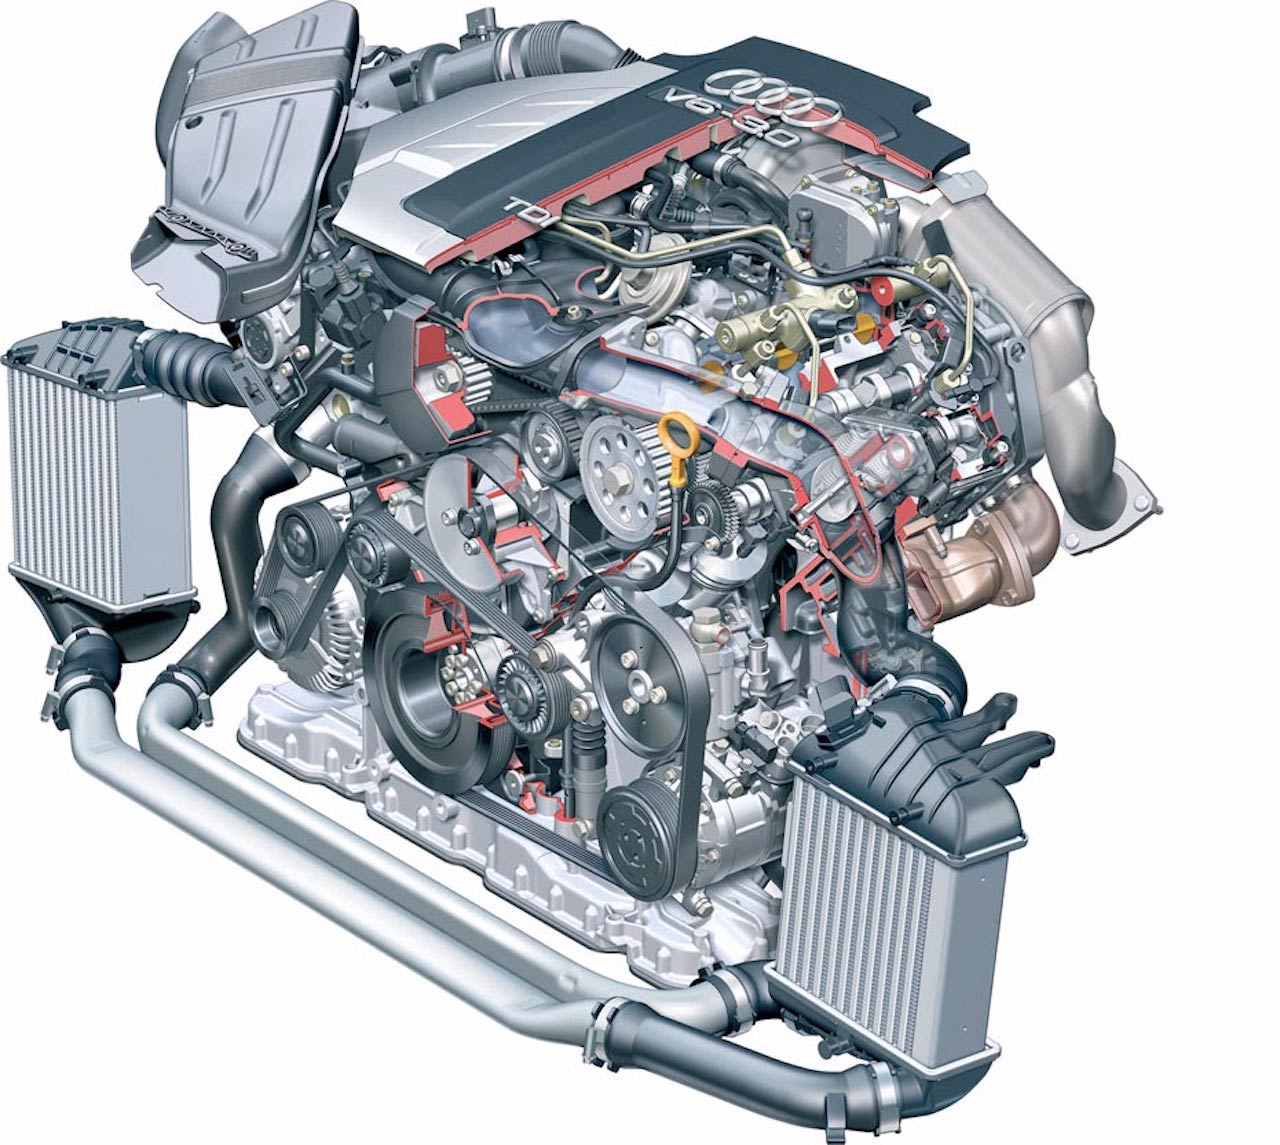 tuto-remplacement-injecteur-v6-30-TDI-Audi-A4-b7-2.jpg